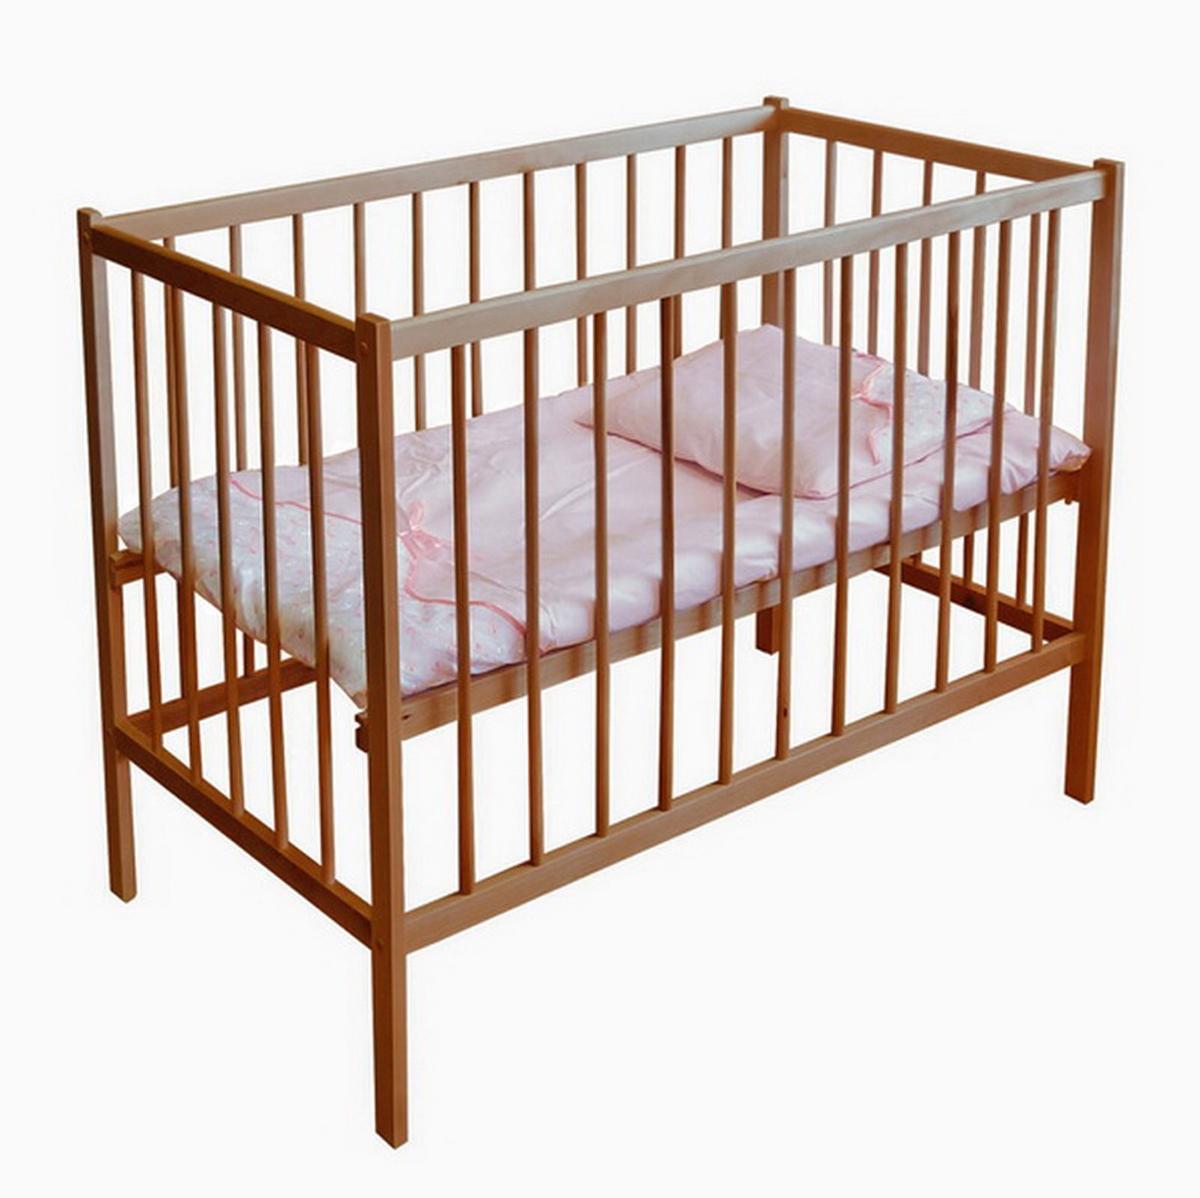 Фея Кровать детская цвет орех 0005509-02 ваза mughal l 20 х 20 х 30 см